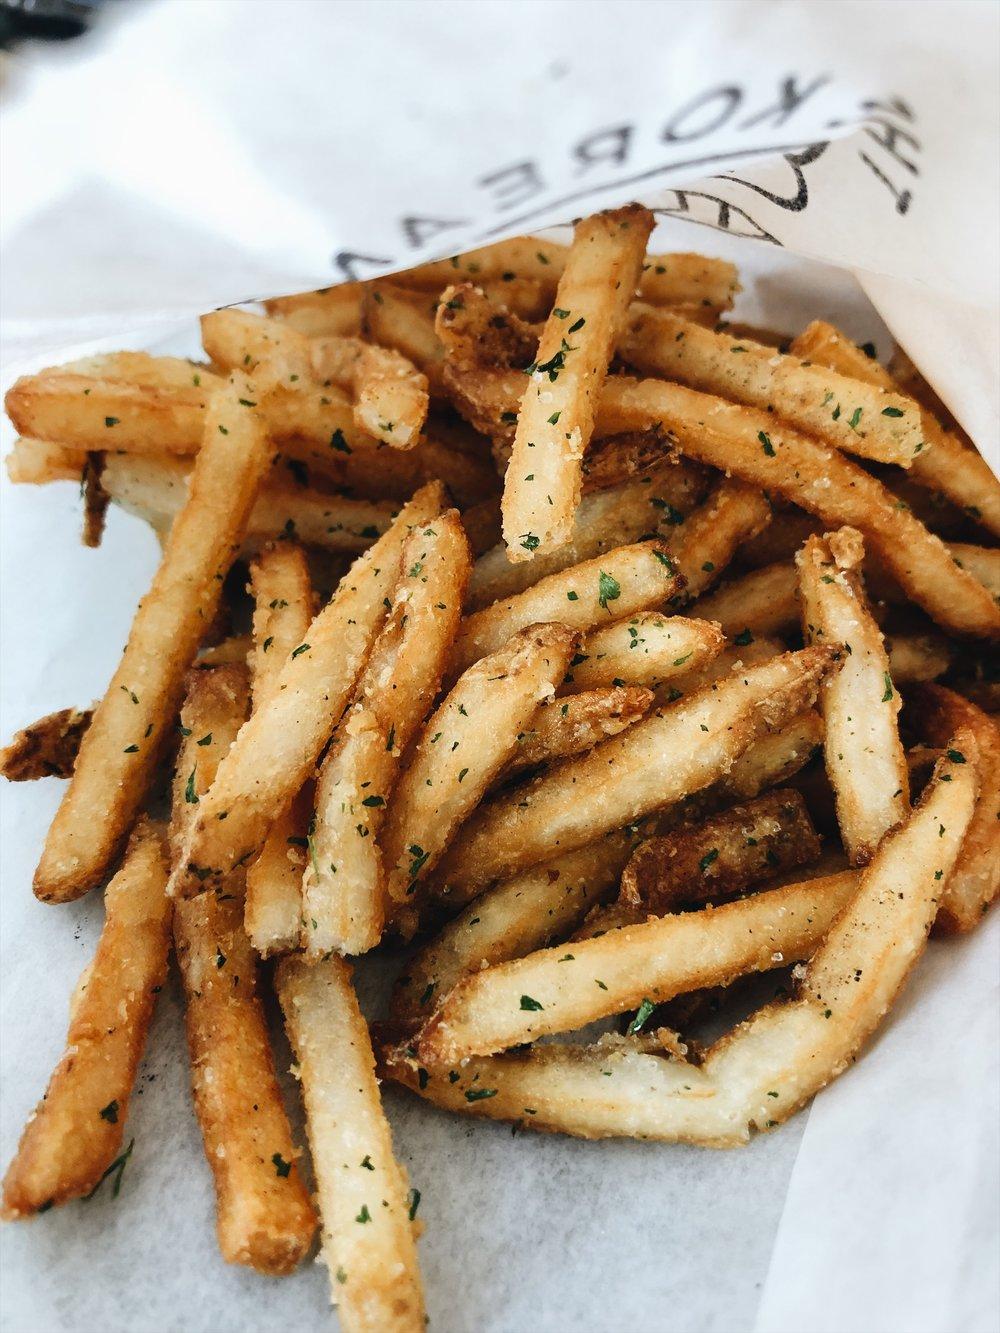 Truffle fries! So damn good!